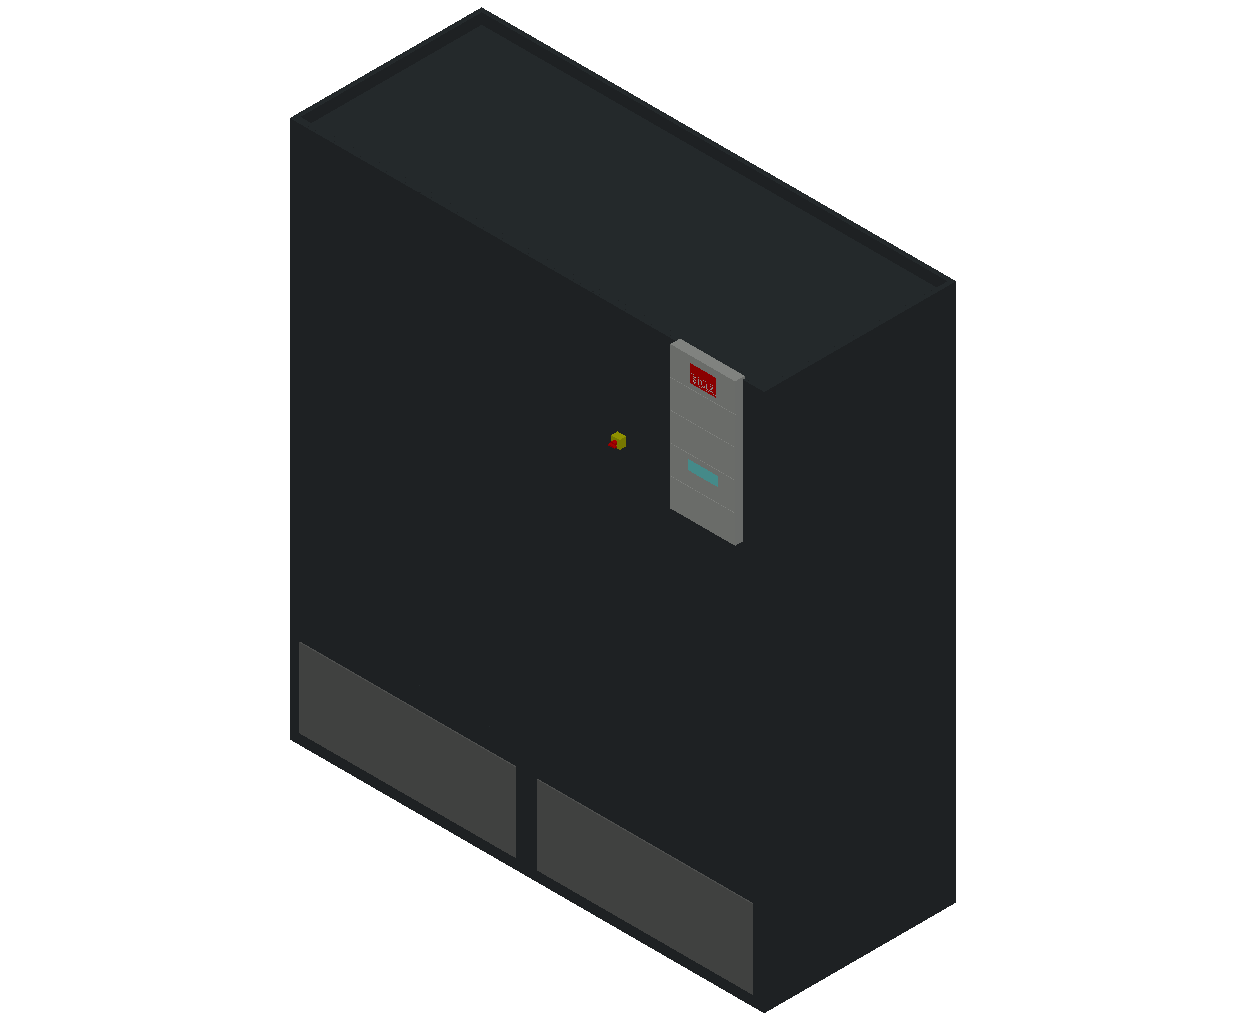 HC_Air Conditioner_Indoor Unit_MEPcontent_STULZ_CyberAir 3PRO_ASR_Dual Circuit A_ASR_892_A_INT-EN.dwg